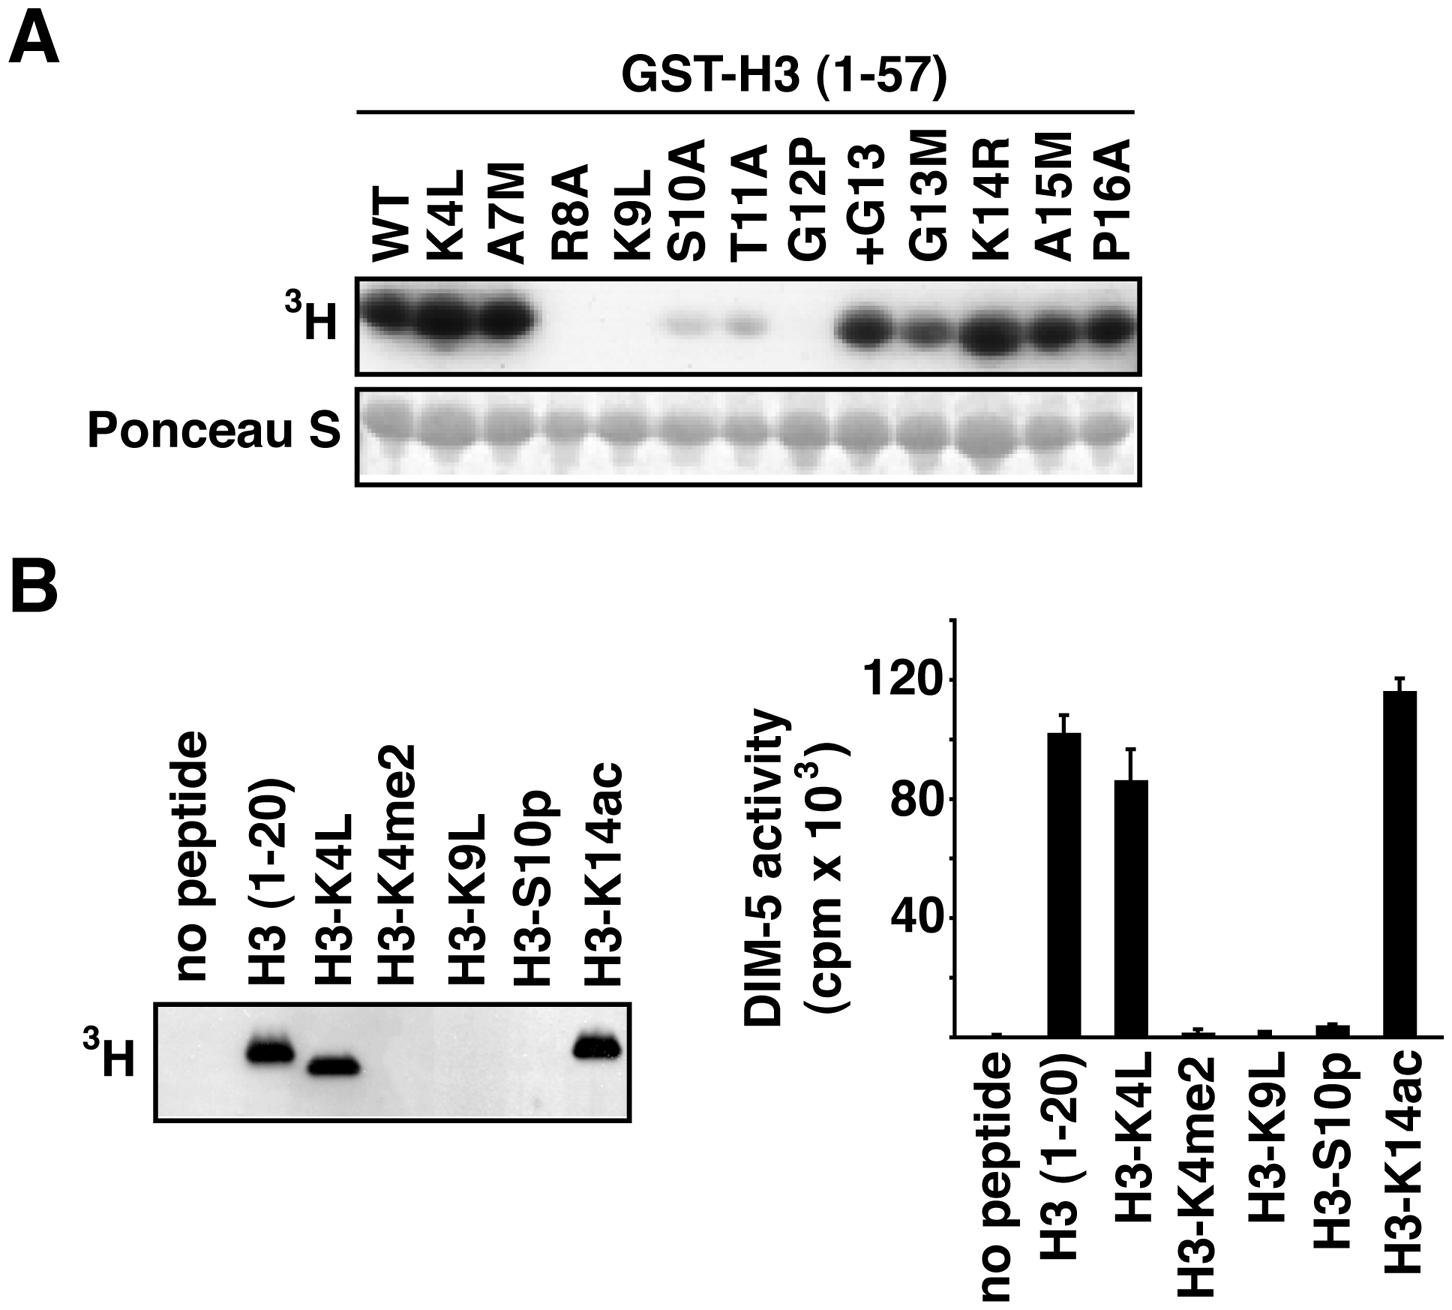 DIM-5 activity on histone H3 peptides.